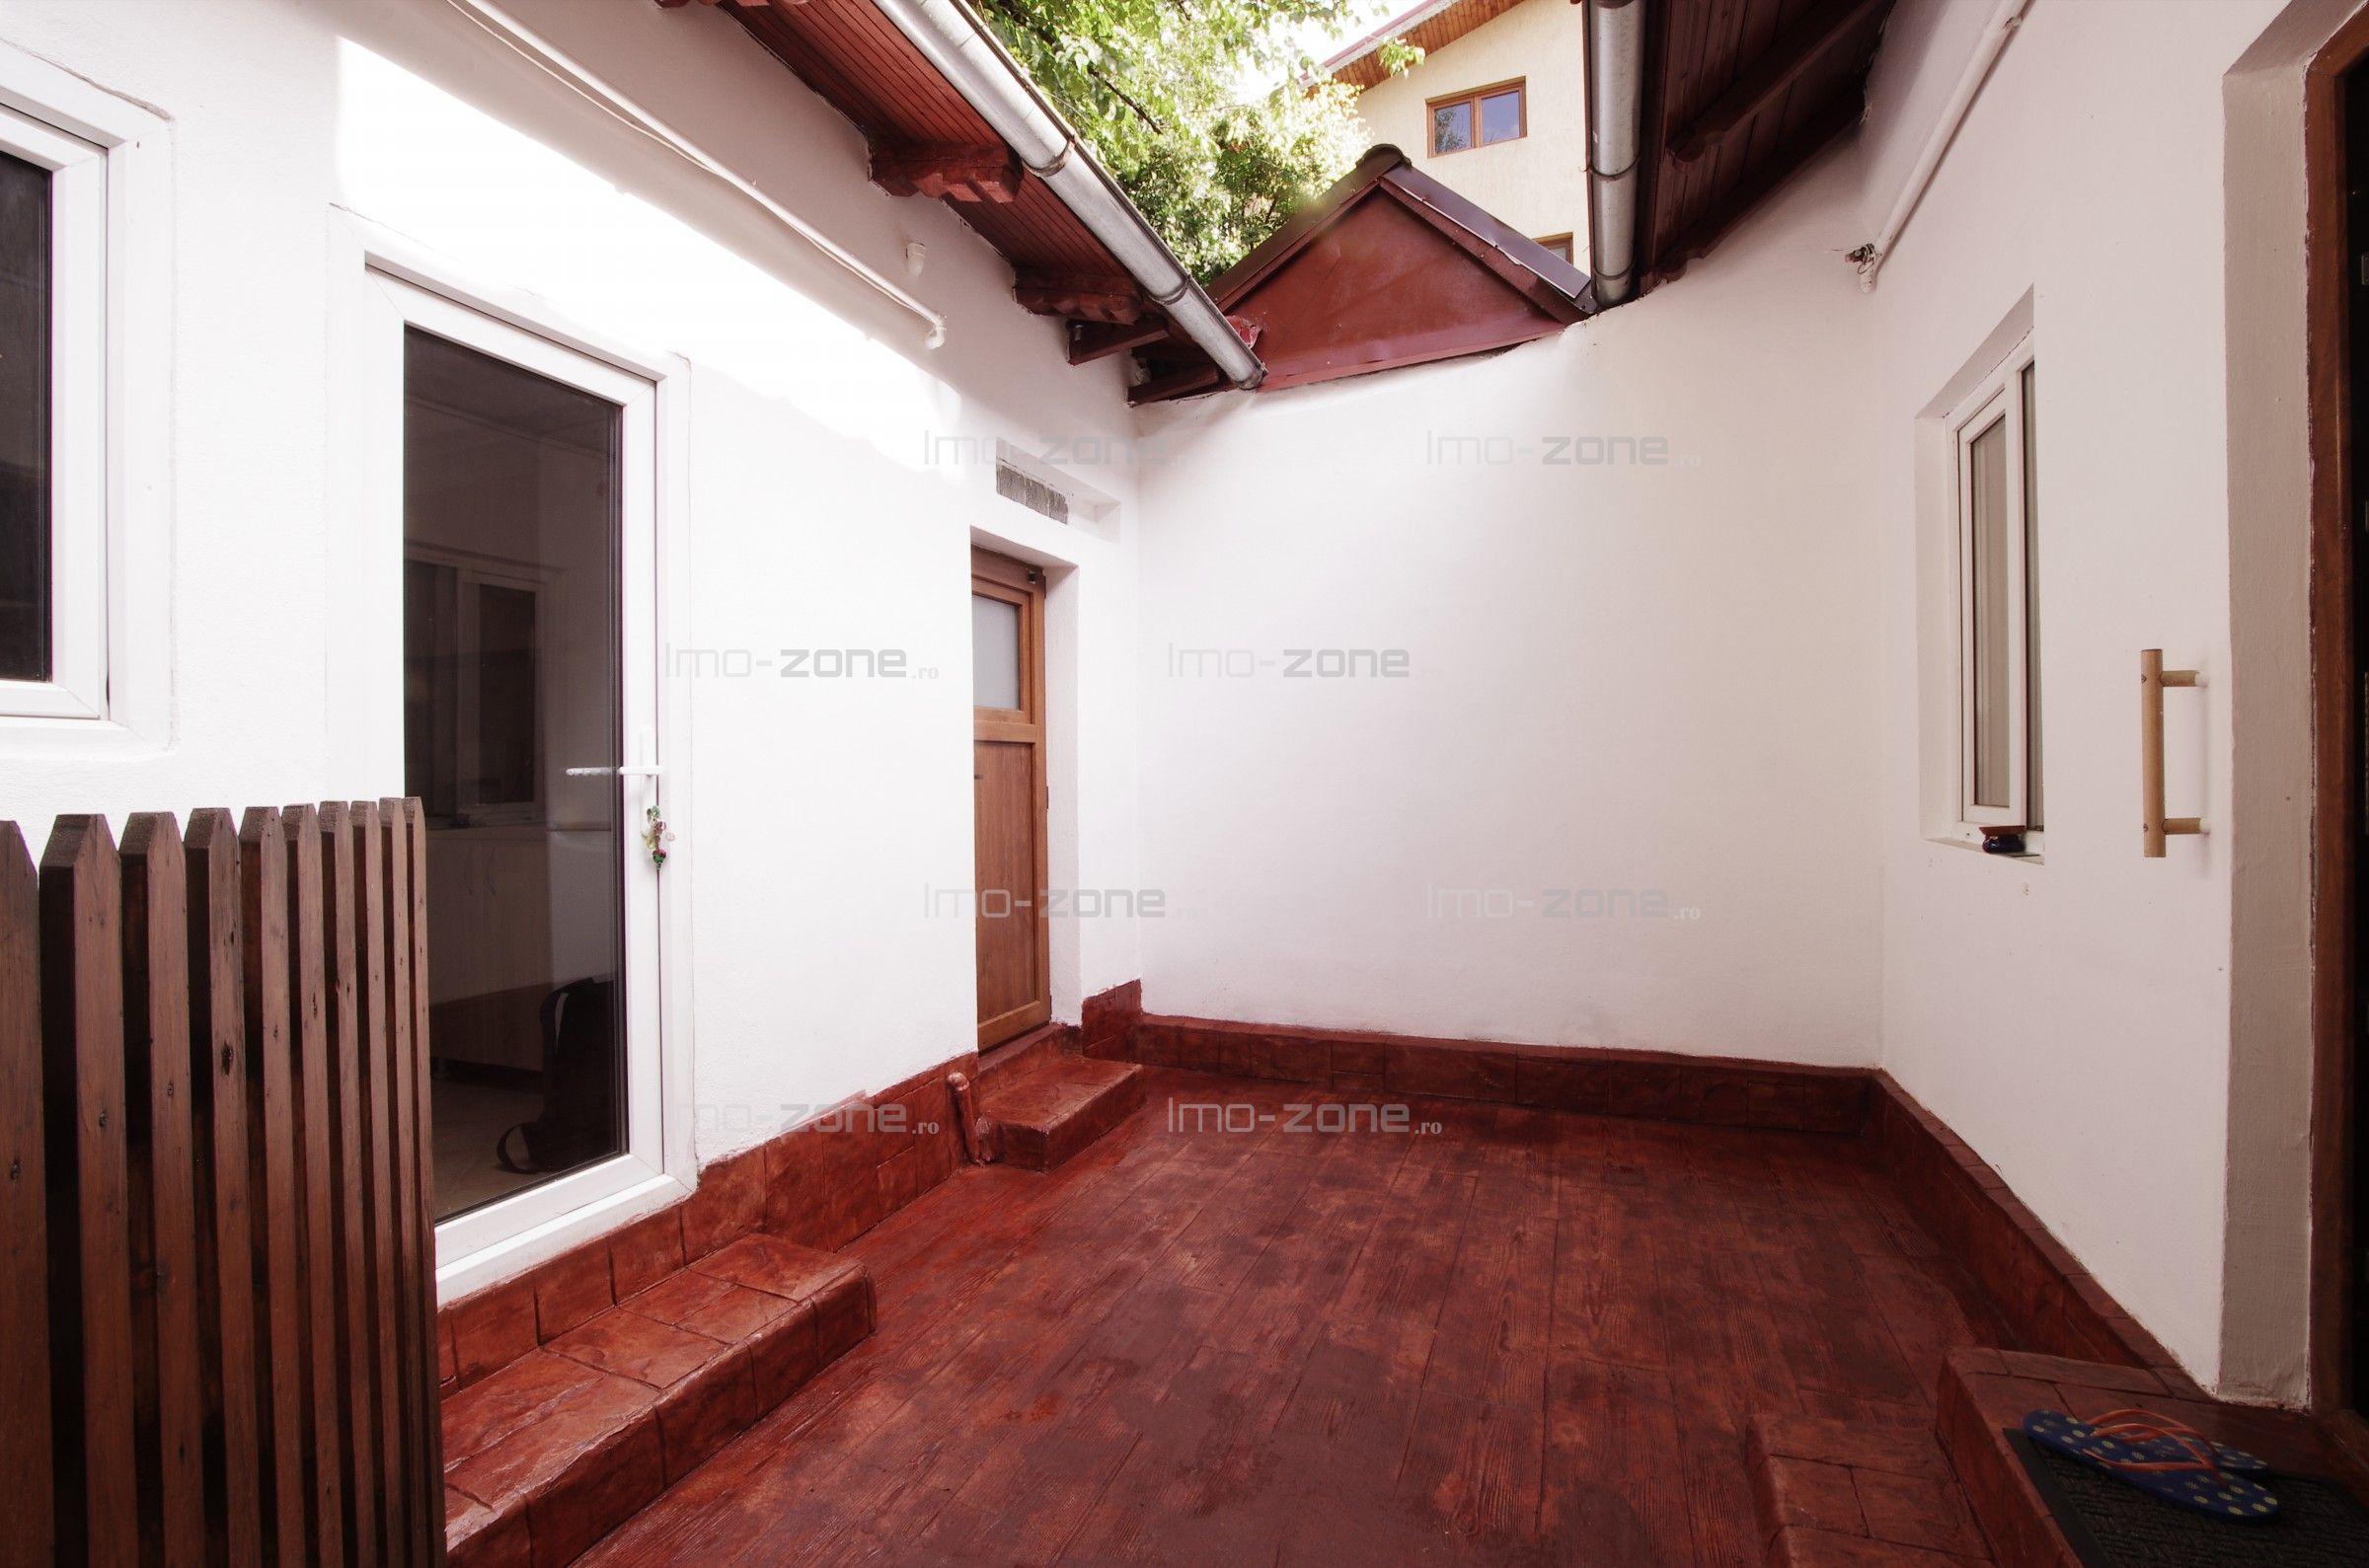 3 camere (2 camere + birou)+ terasa, Drumul Taberei - Razoare / Drumul Sarii